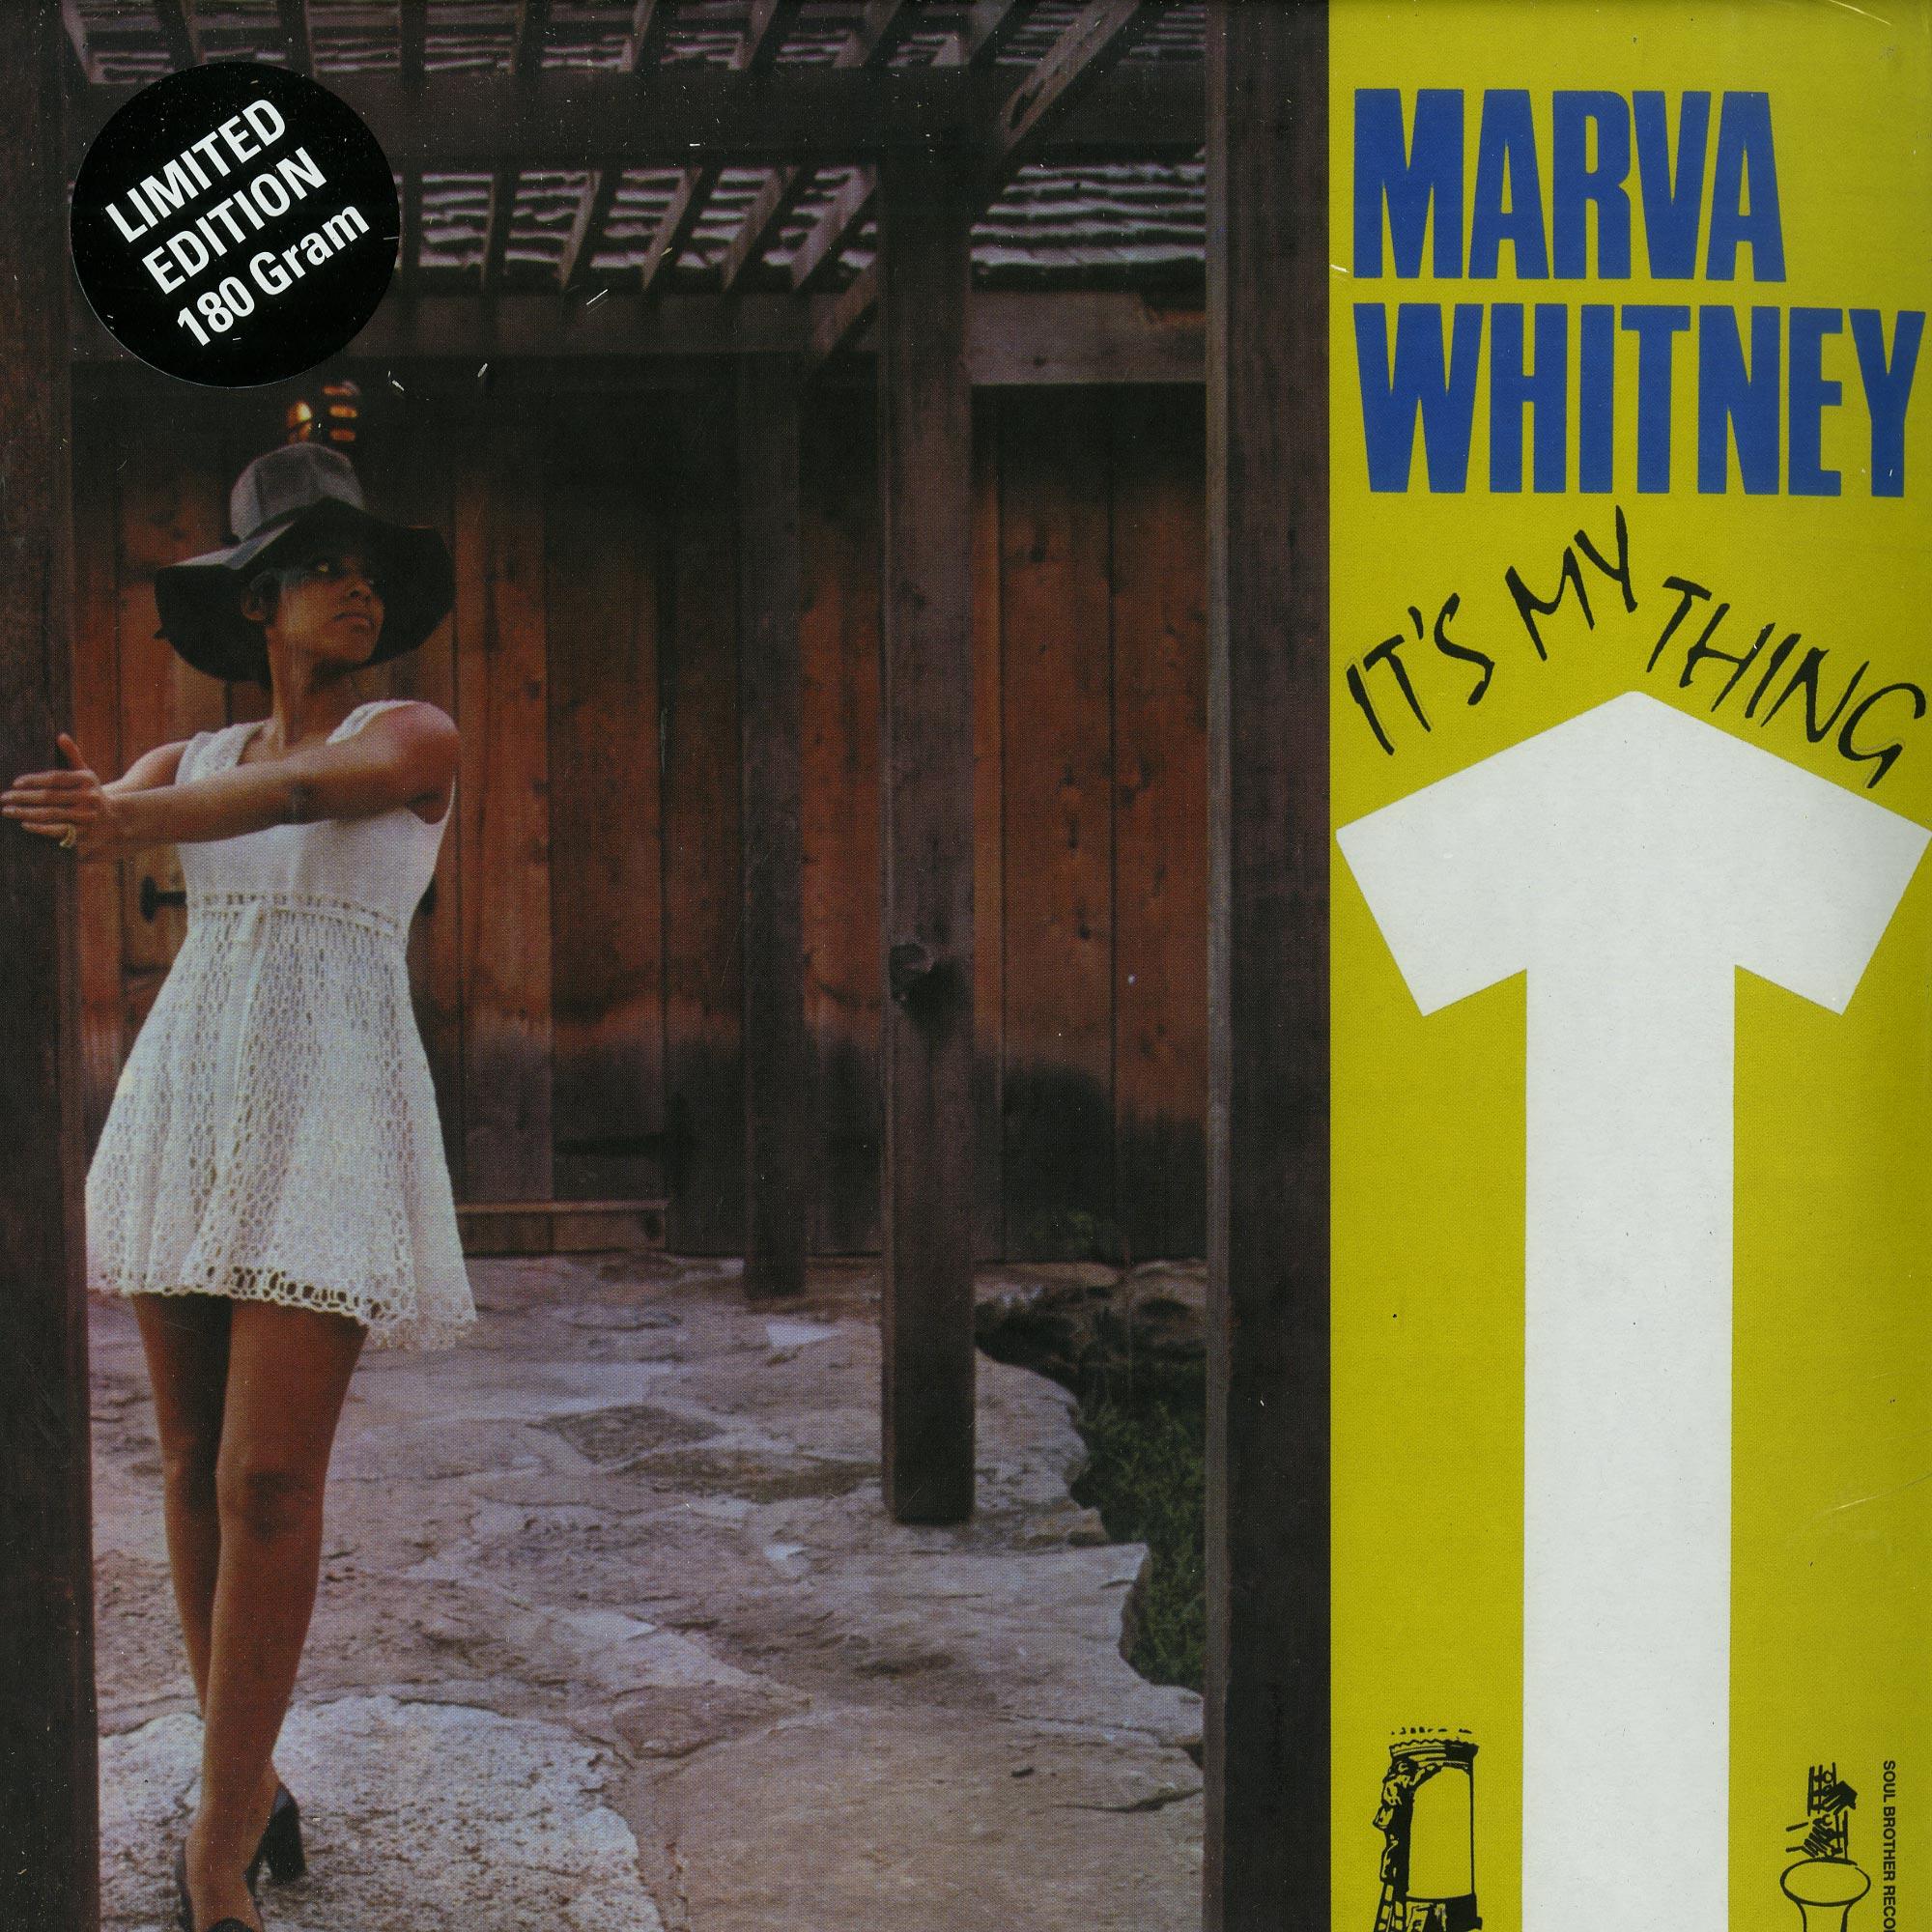 Marva Whitney - IT S MY THING